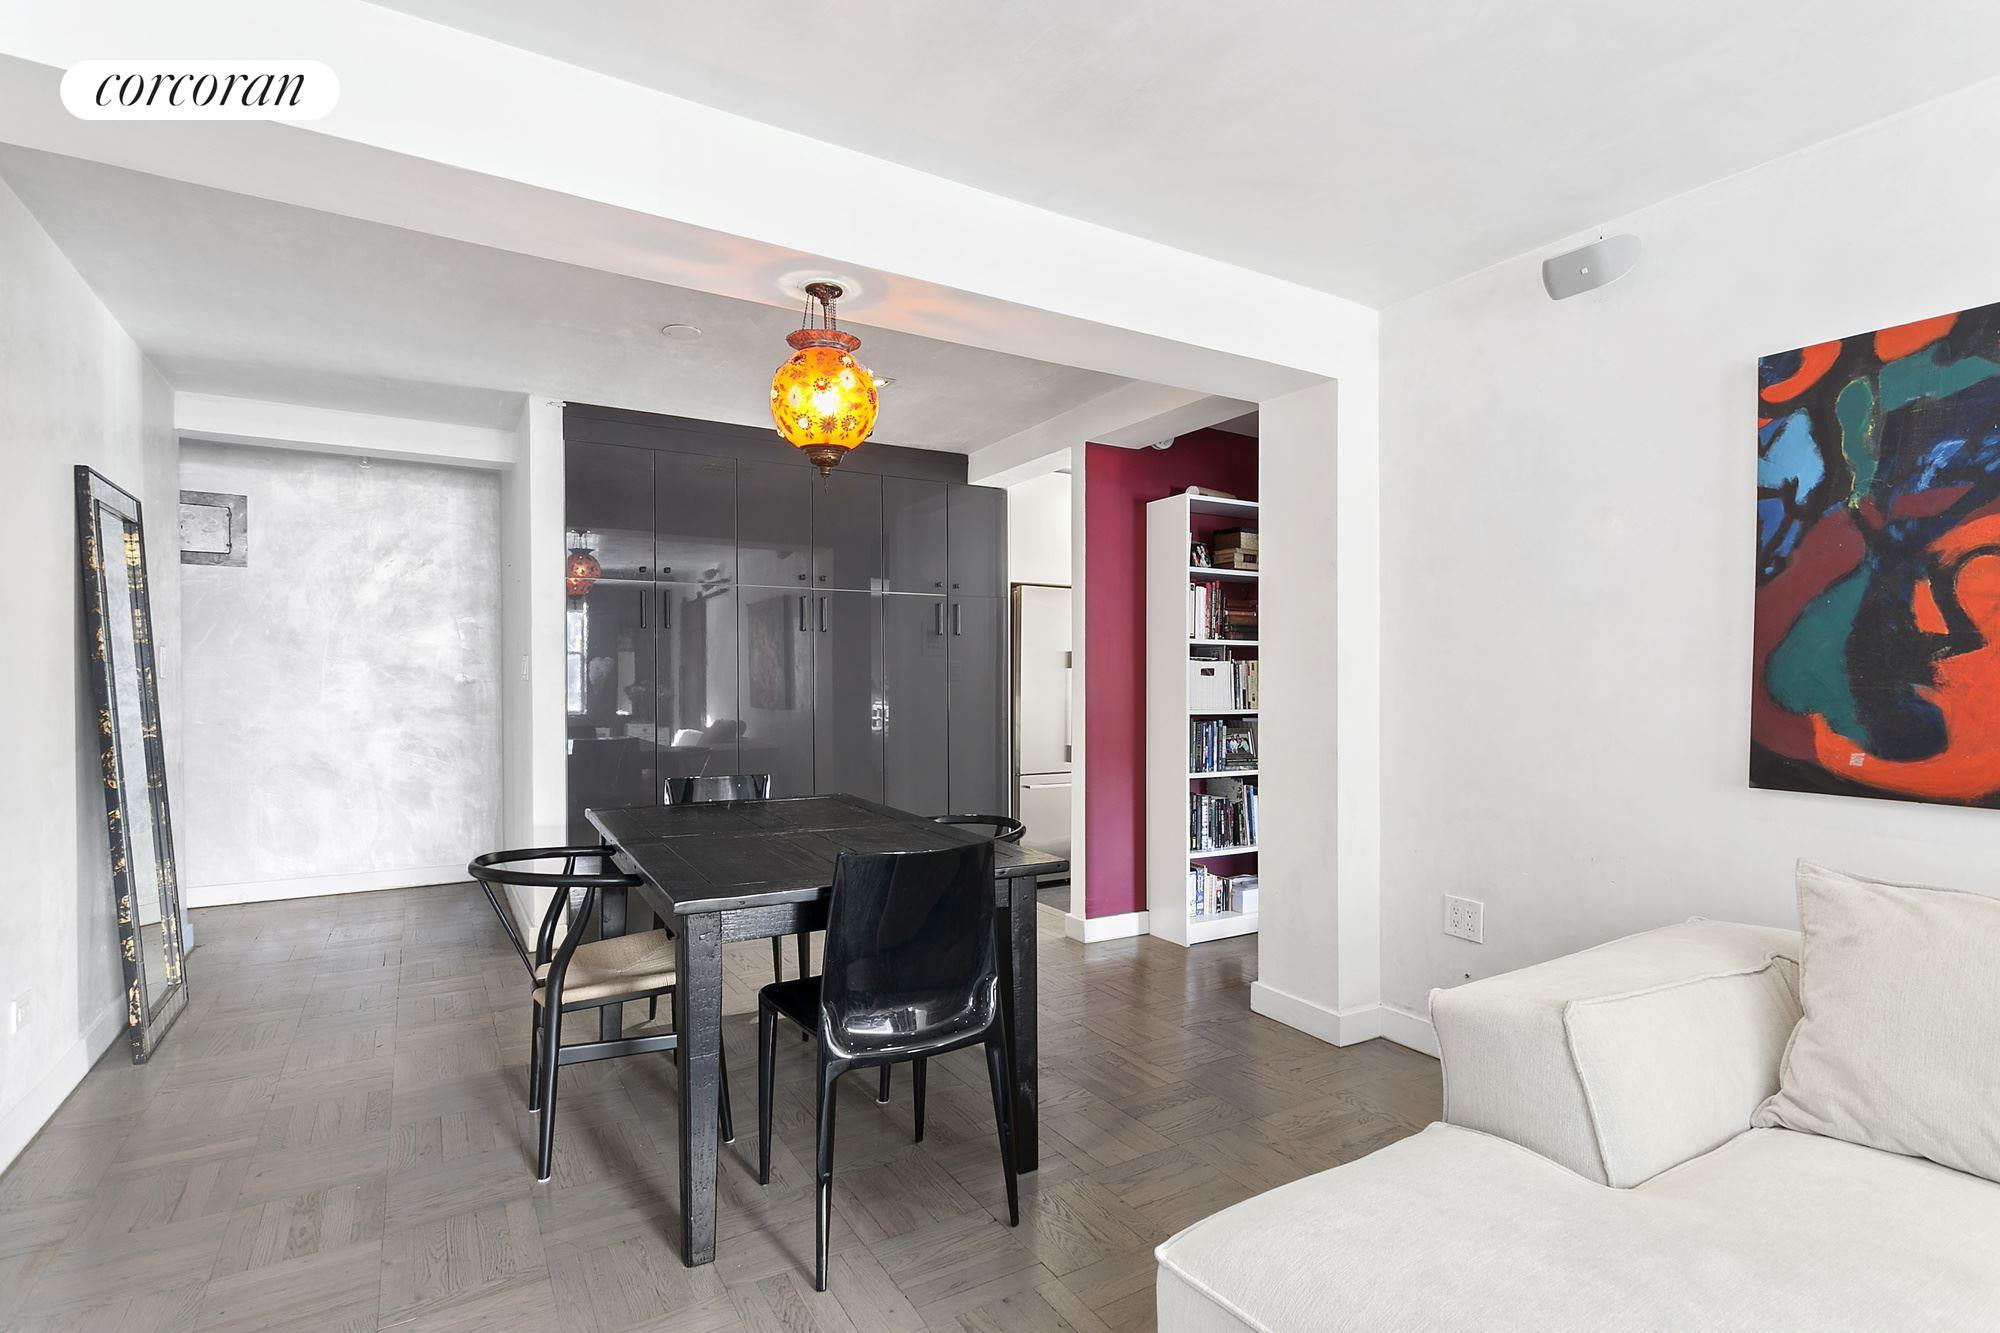 Corcoran, 185 WEST HOUSTON ST, Apt. 1G, Soho/Nolita Real Estate ...